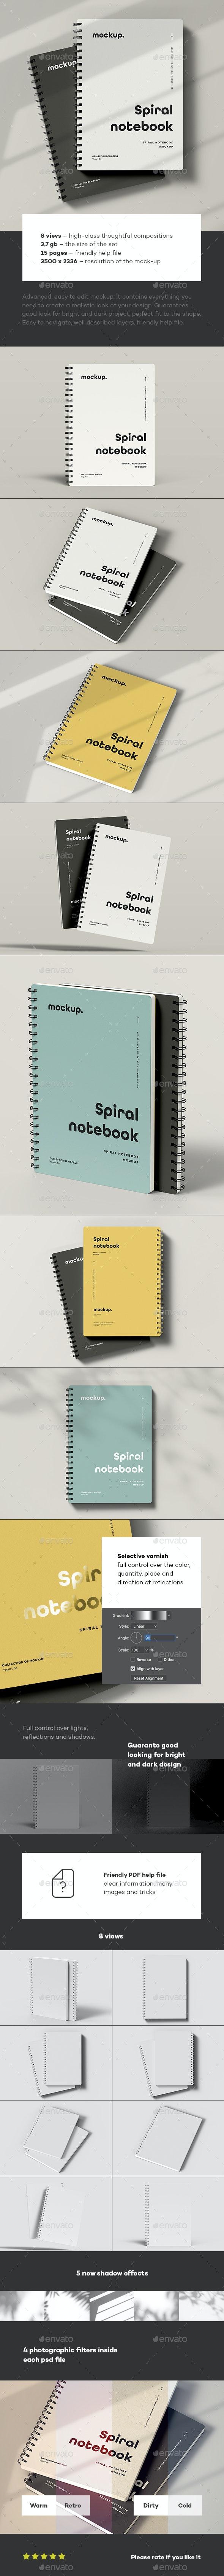 Spiral Notebook Mock-up - Stationery Print